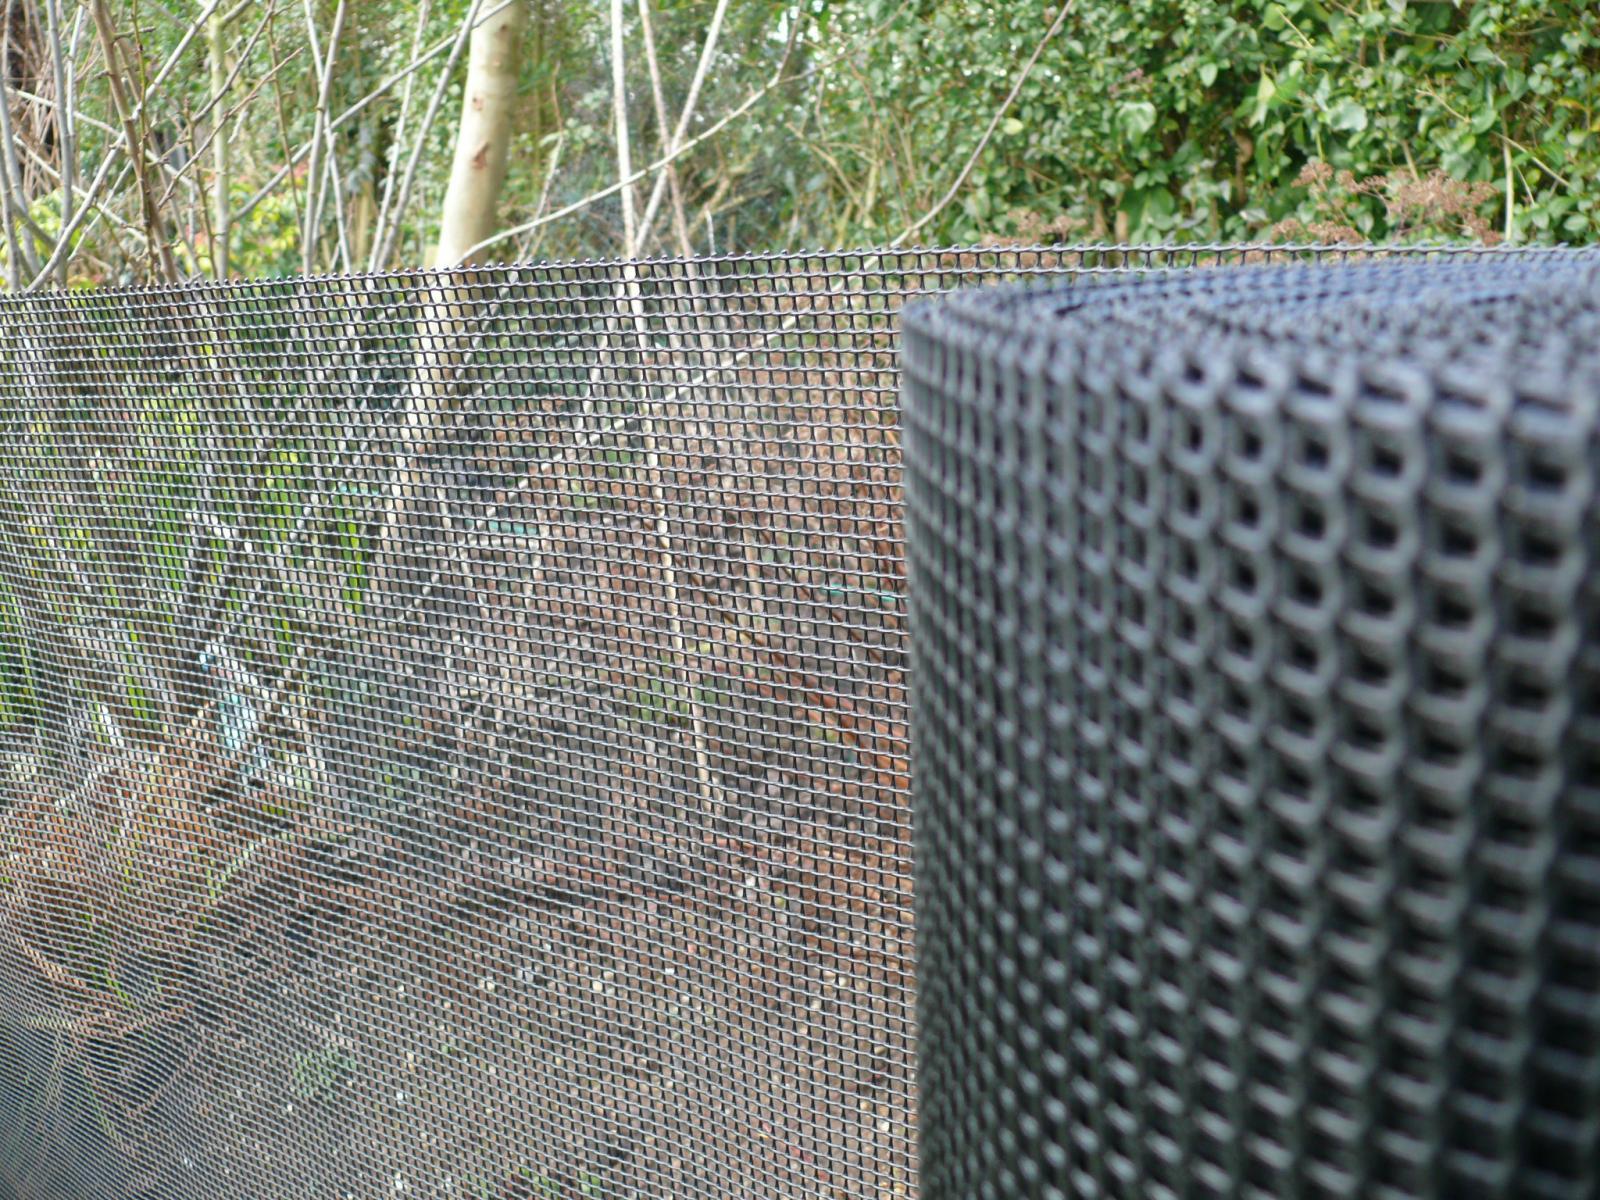 Garden plastic mesh fence plant protection dog barrier m